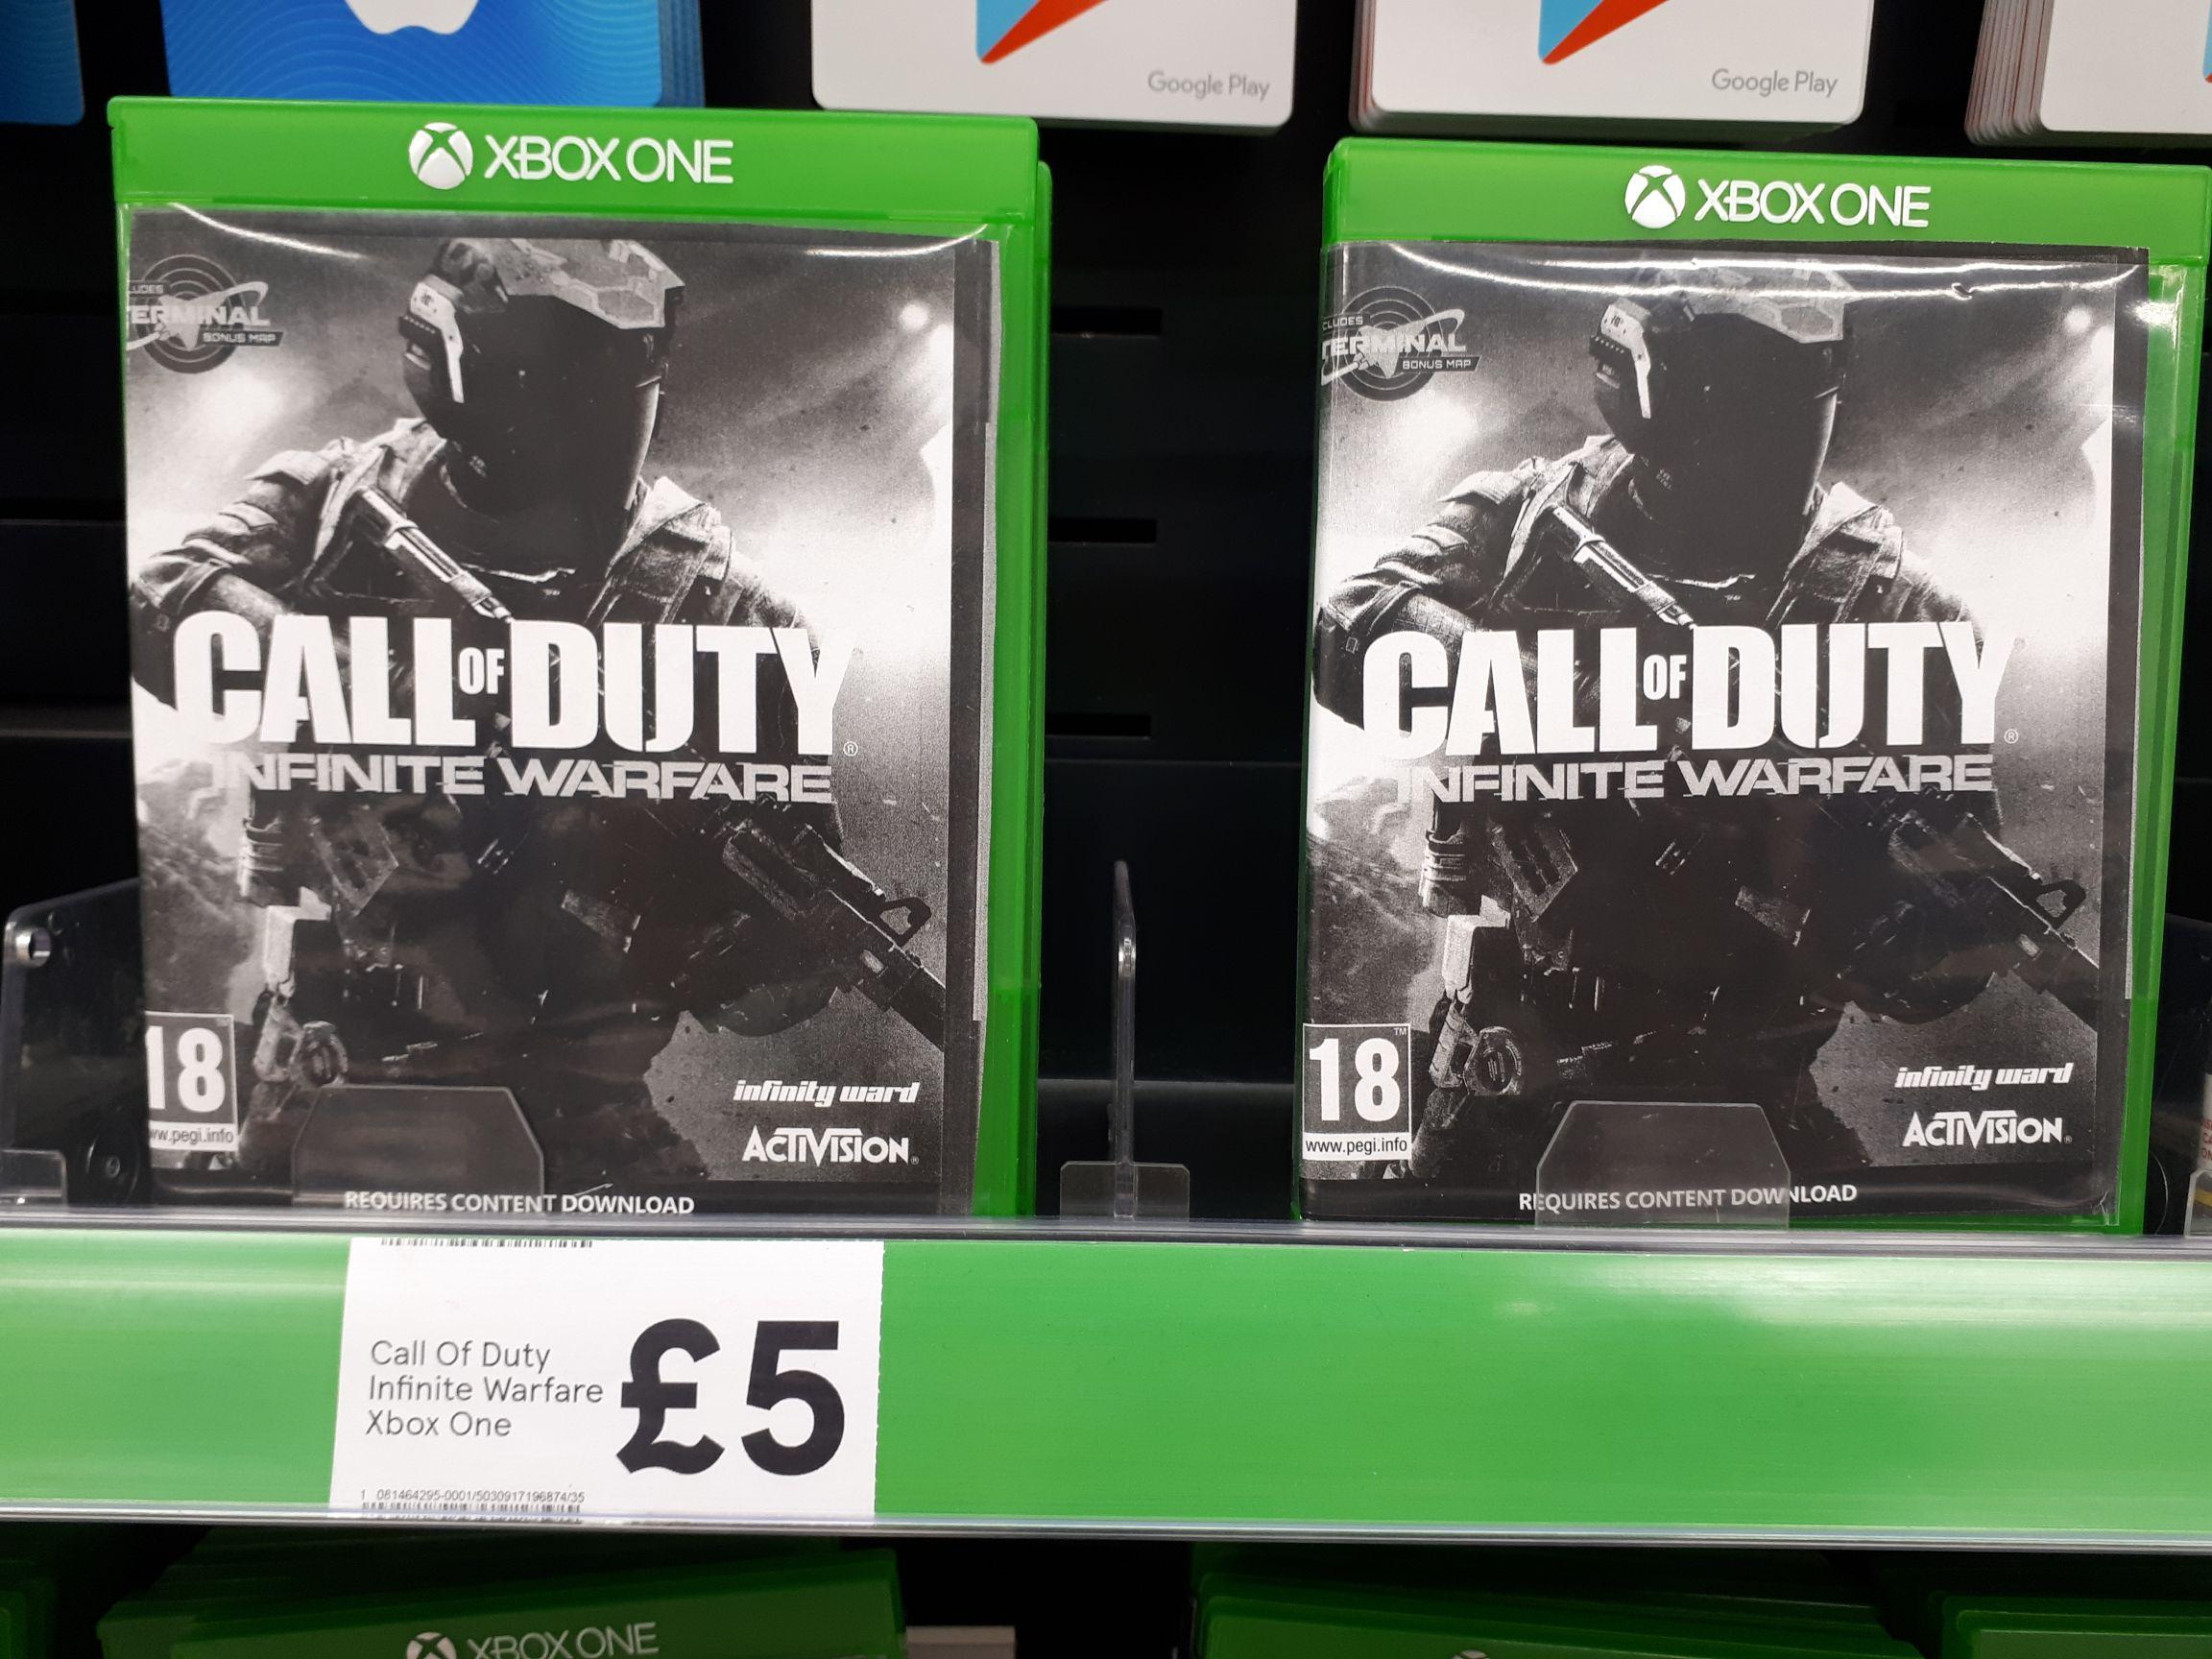 Call of Duty Infinite Warfare £5 at Tesco Sutton